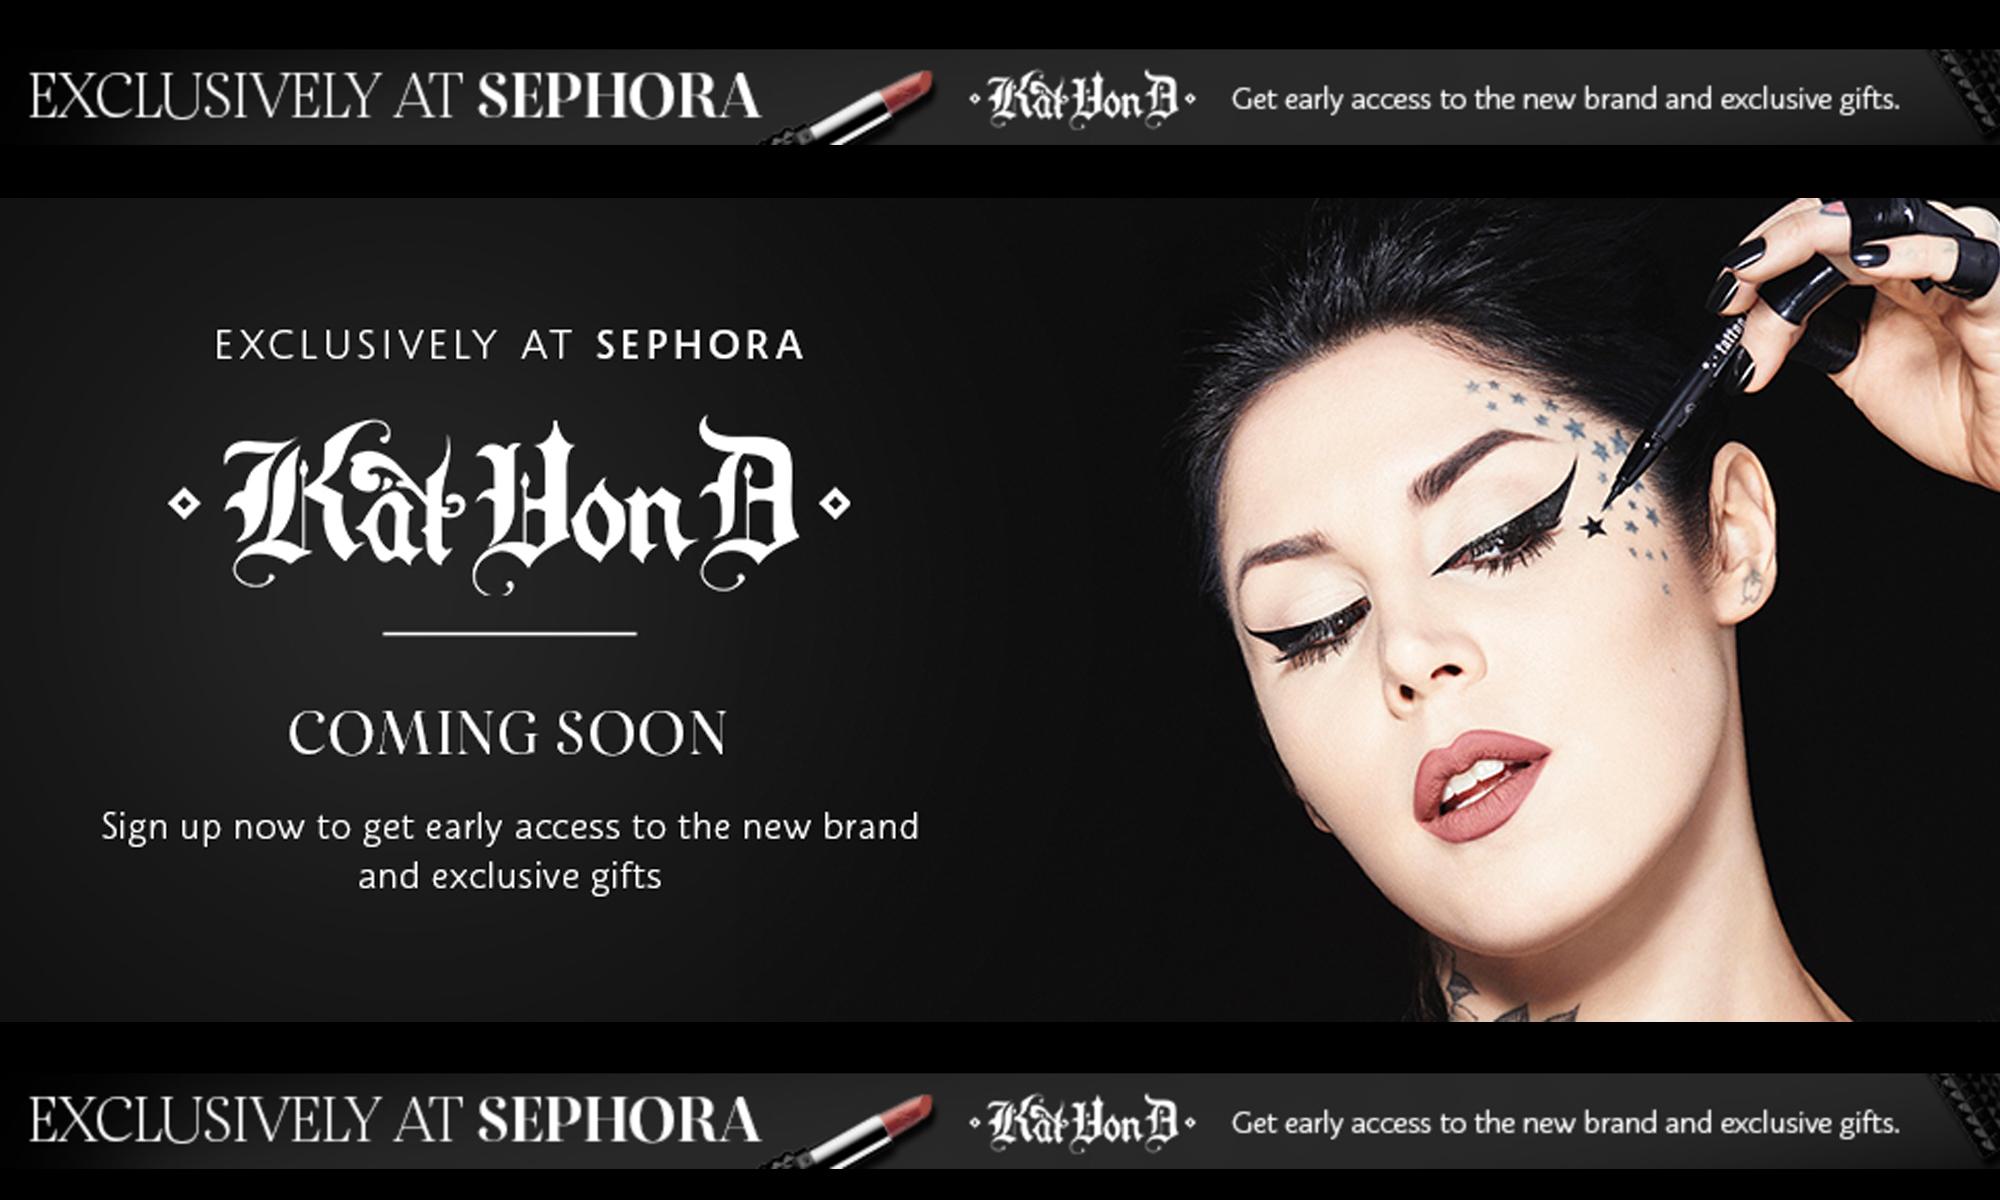 Image via Sephora Philippines